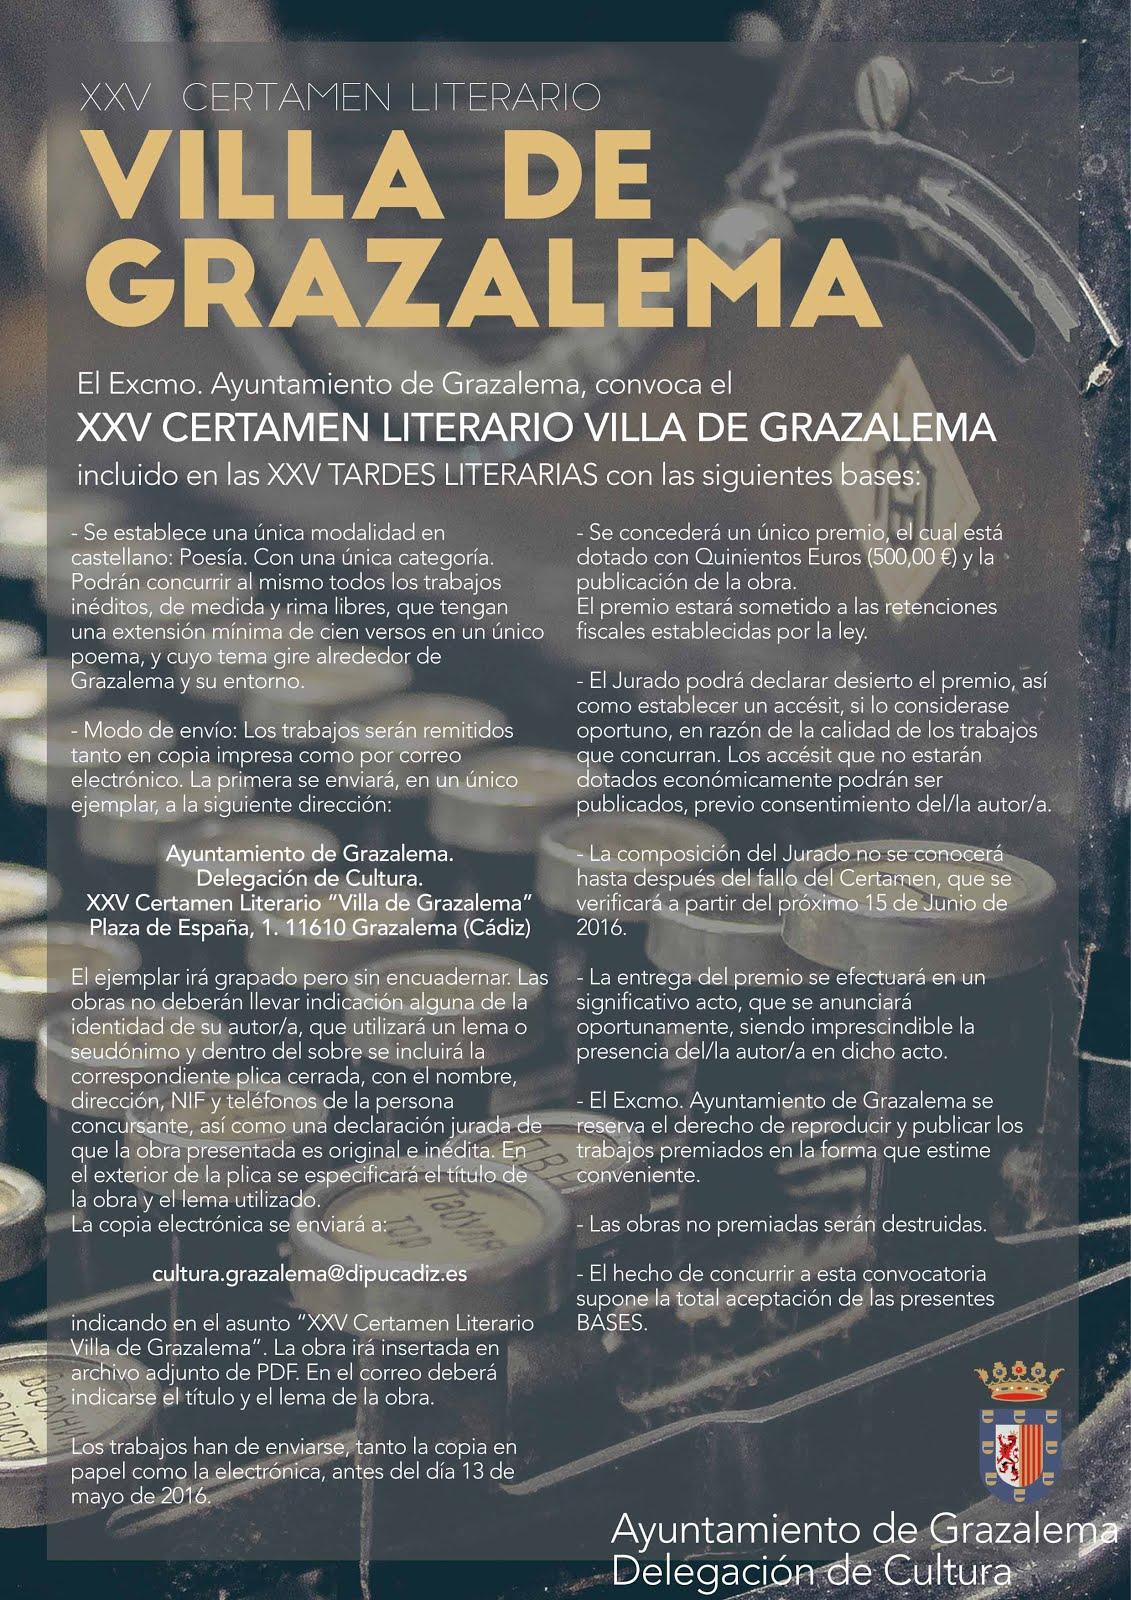 Concurso literario Villa de Grazalema